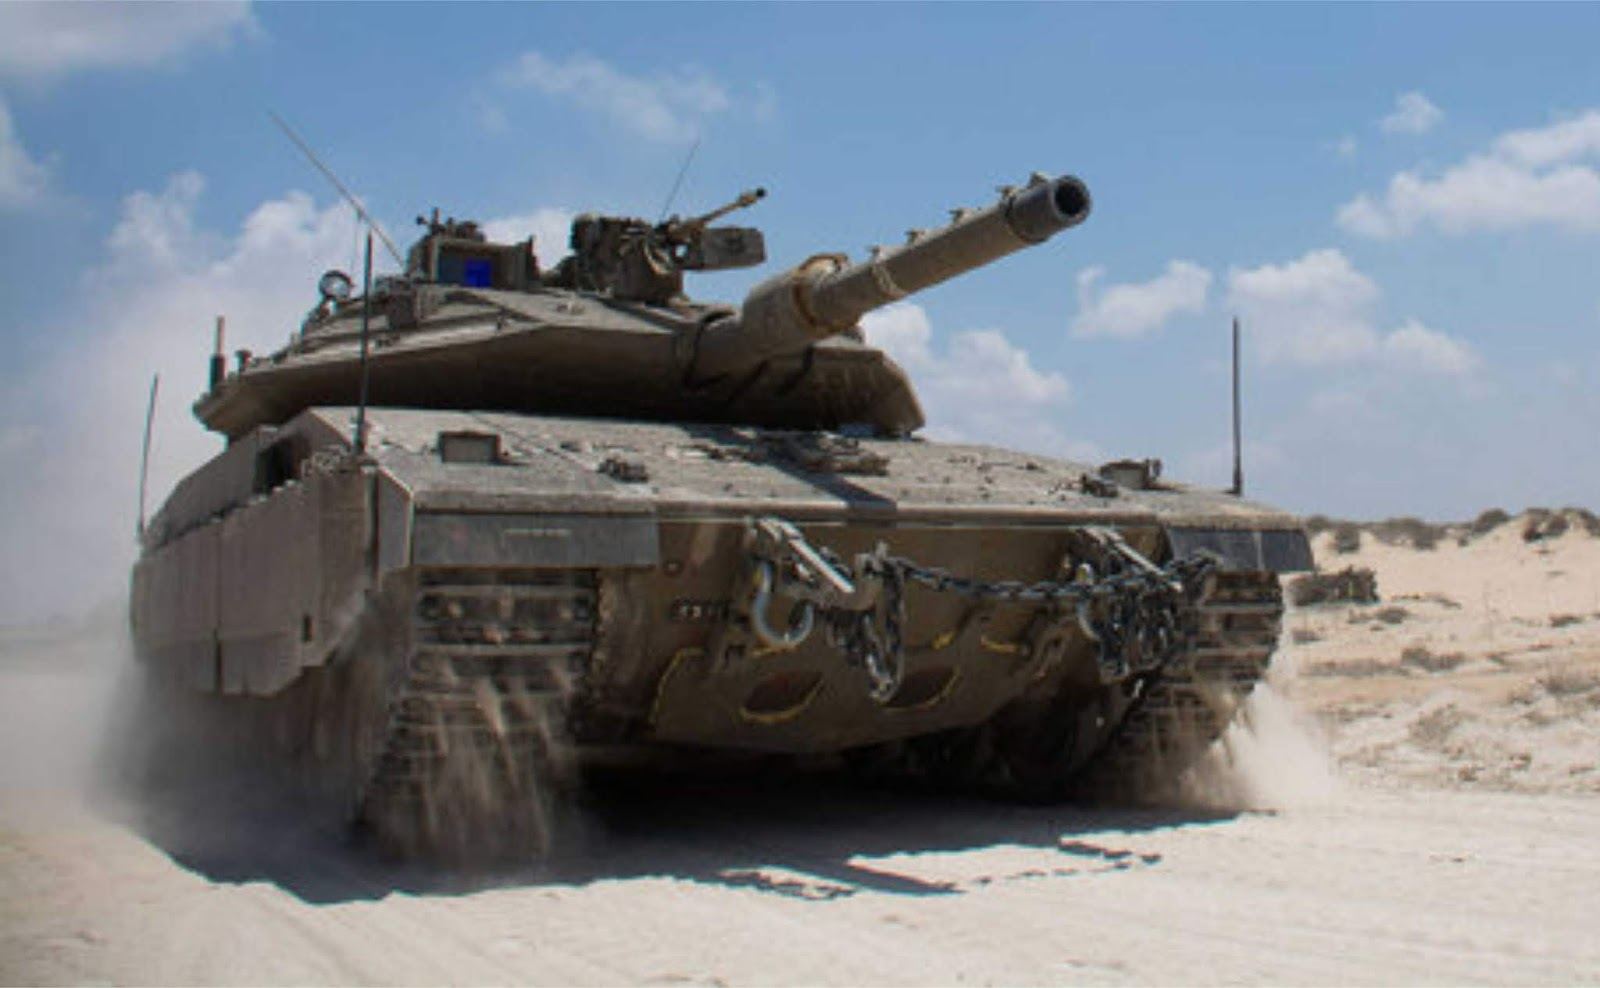 Tank-tank Israel melepaskan tembakan ke Jalur Gaza